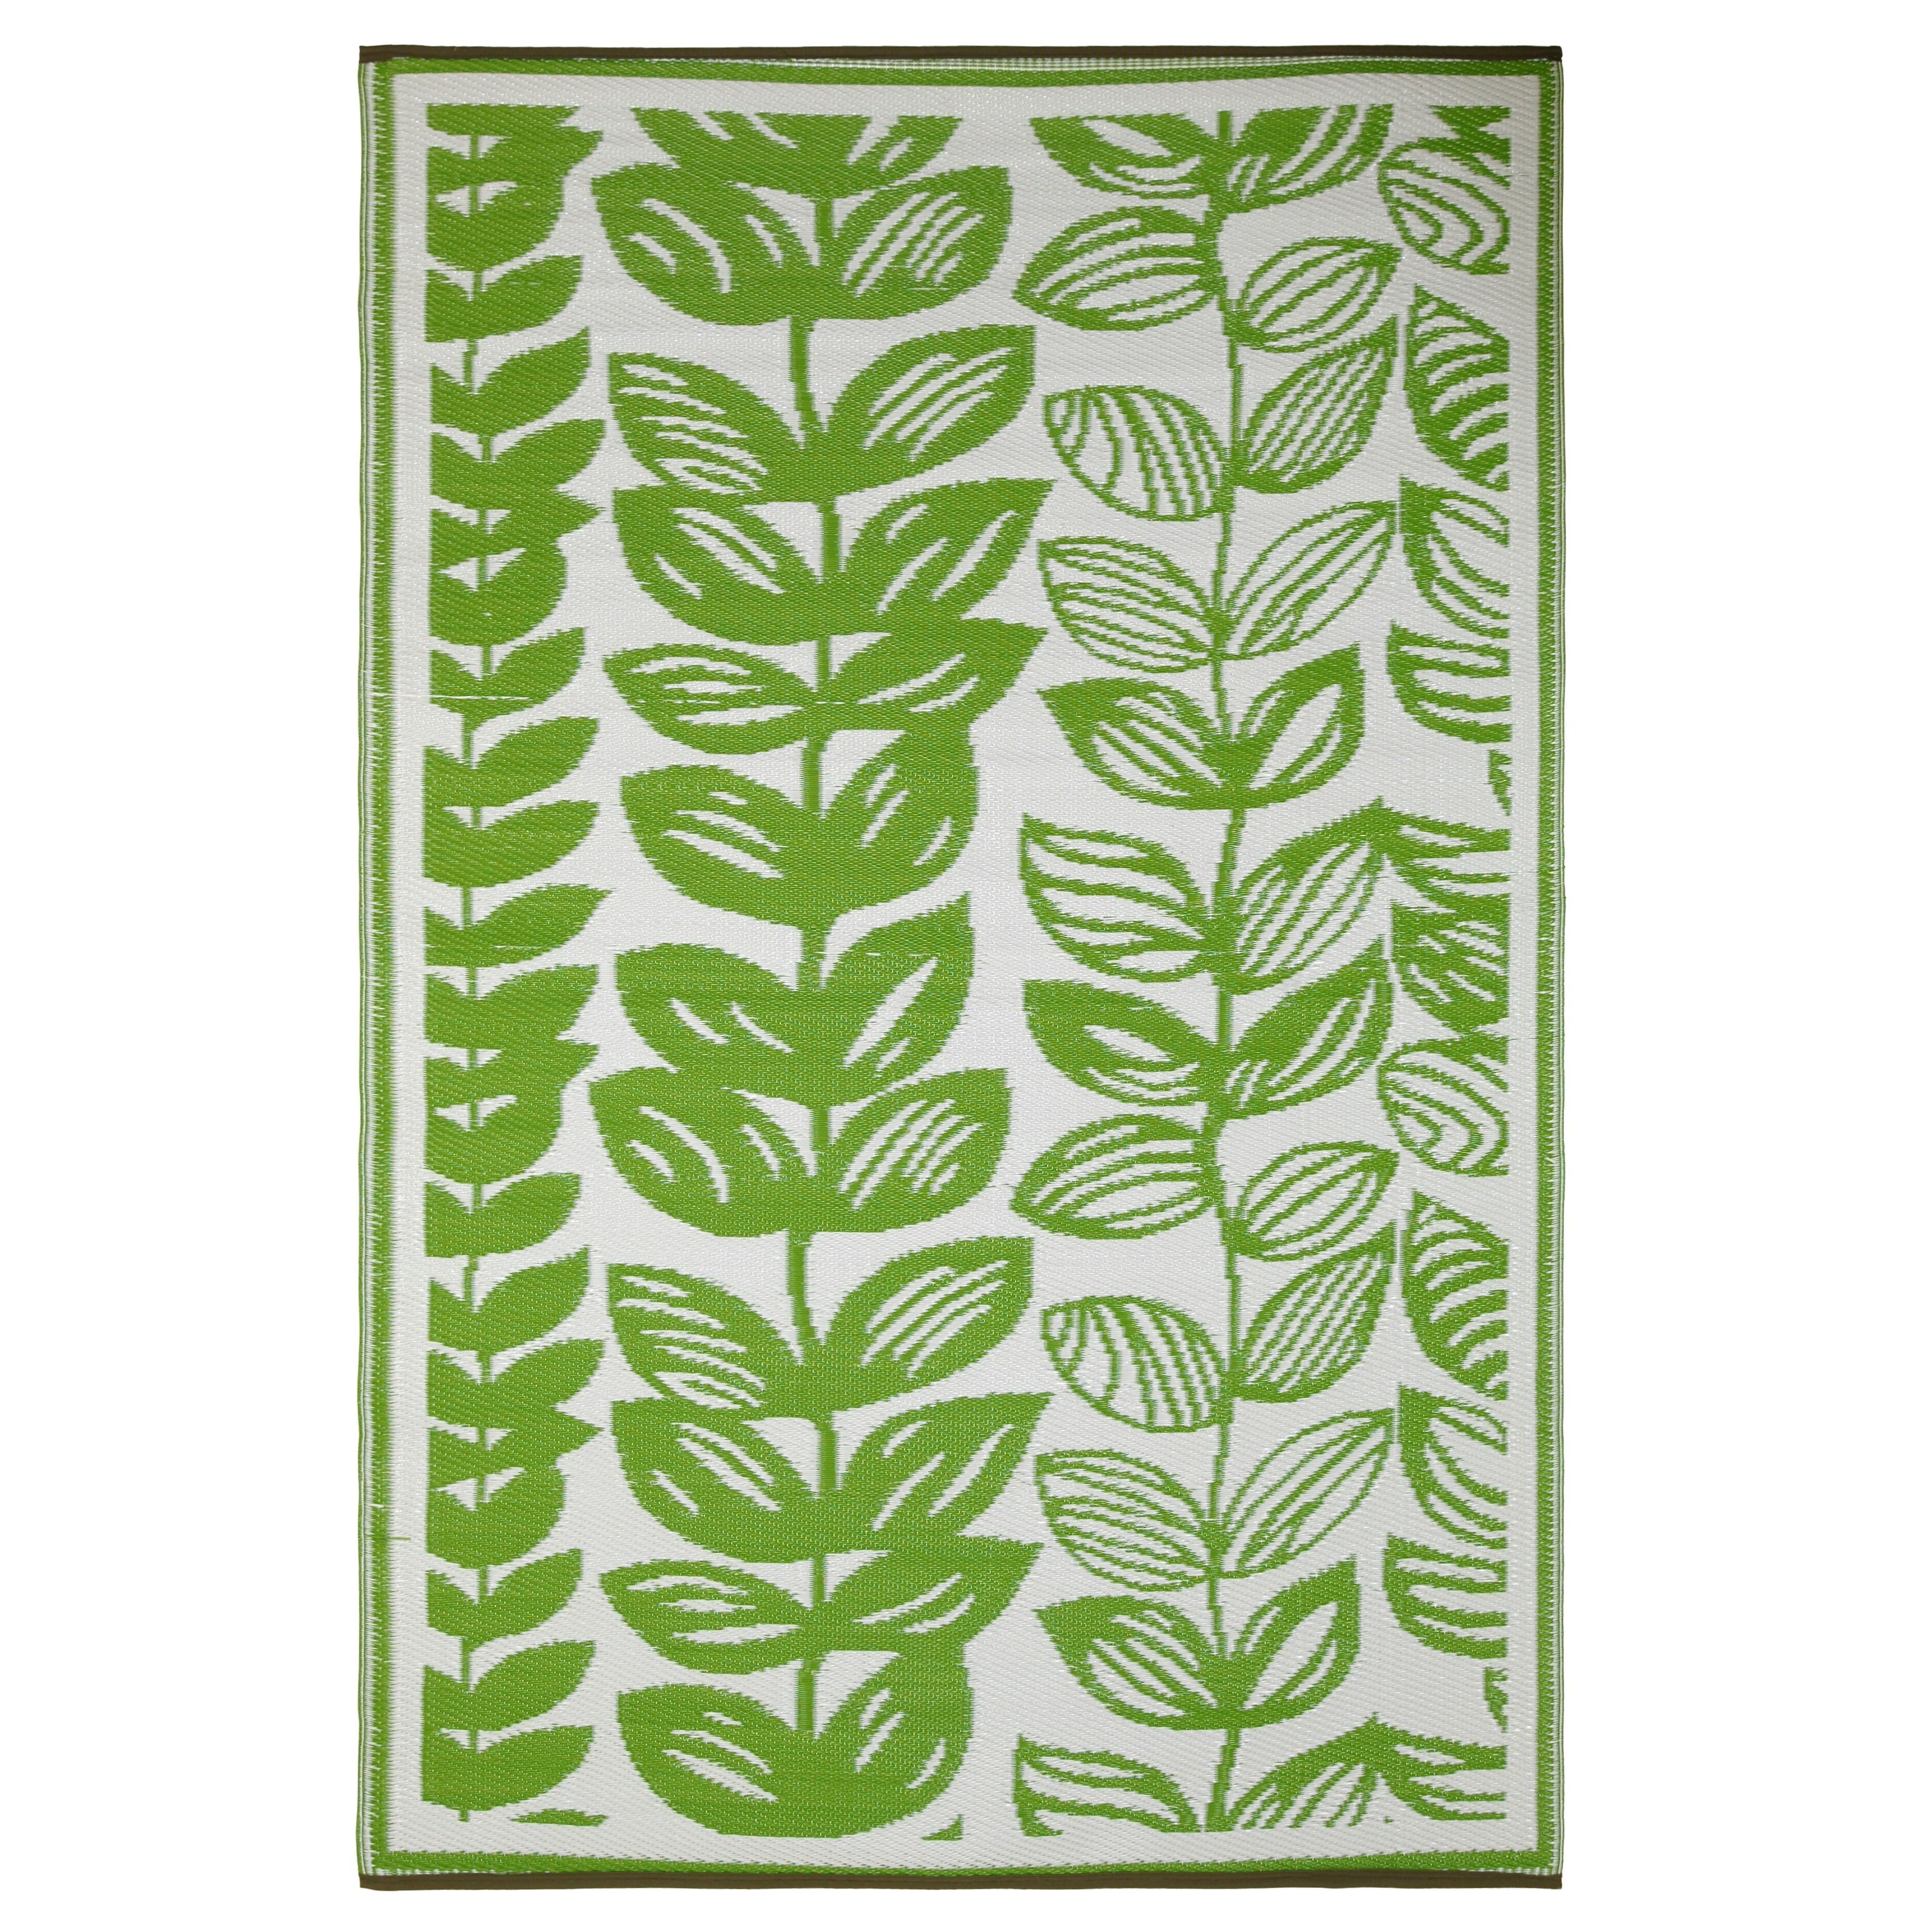 fab rugs world male cream green indoor outdoor area rug reviews wayfair. Black Bedroom Furniture Sets. Home Design Ideas